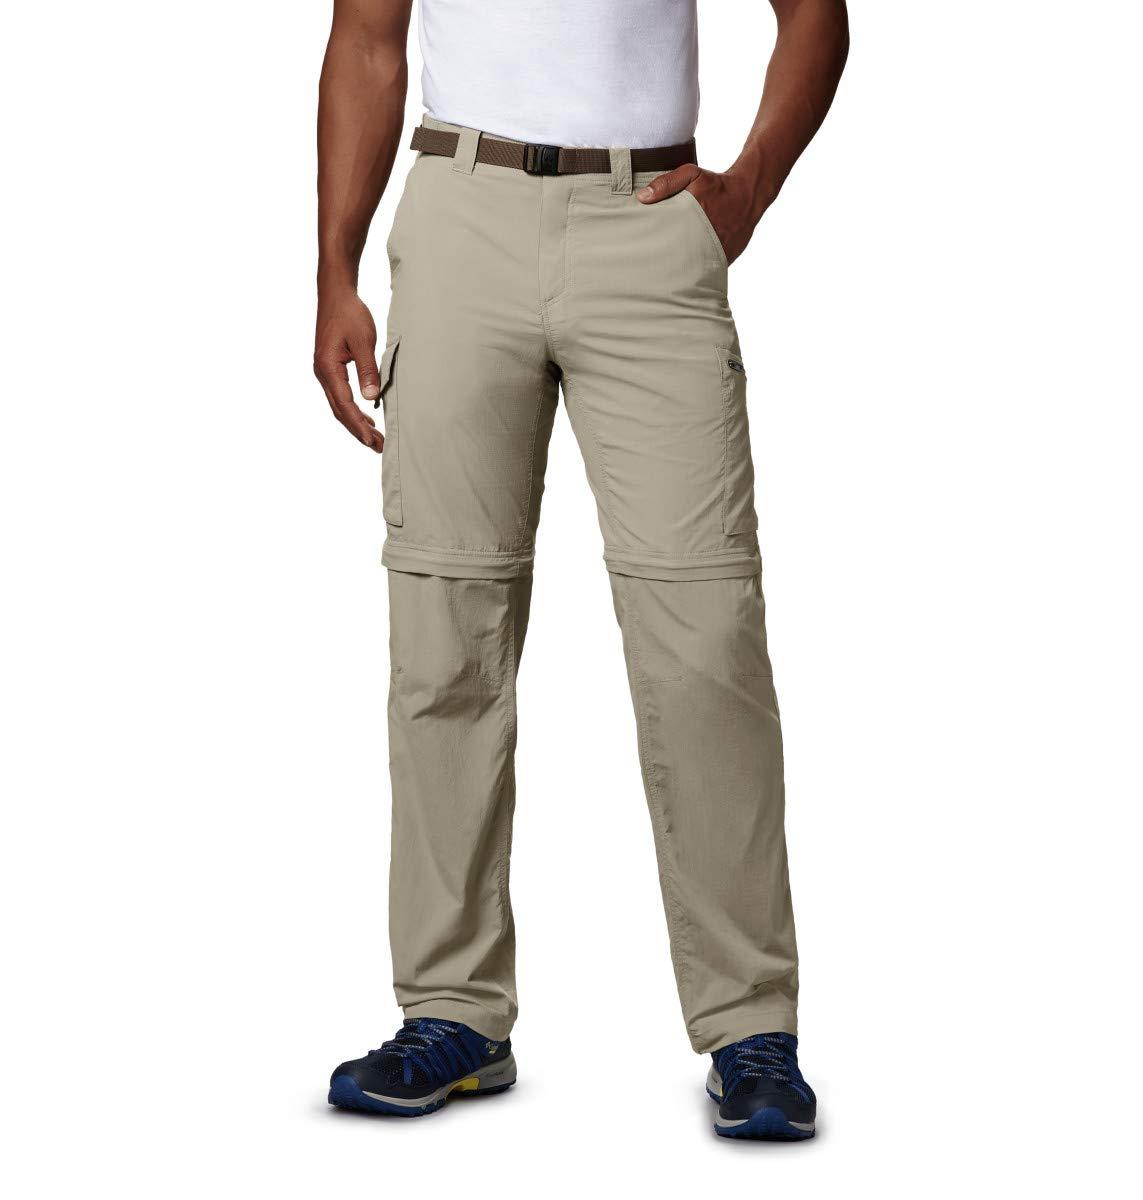 Columbia 2-in-1 Wanderhose für Herren, Silver Ridge Convertible Pants, Nylon, b